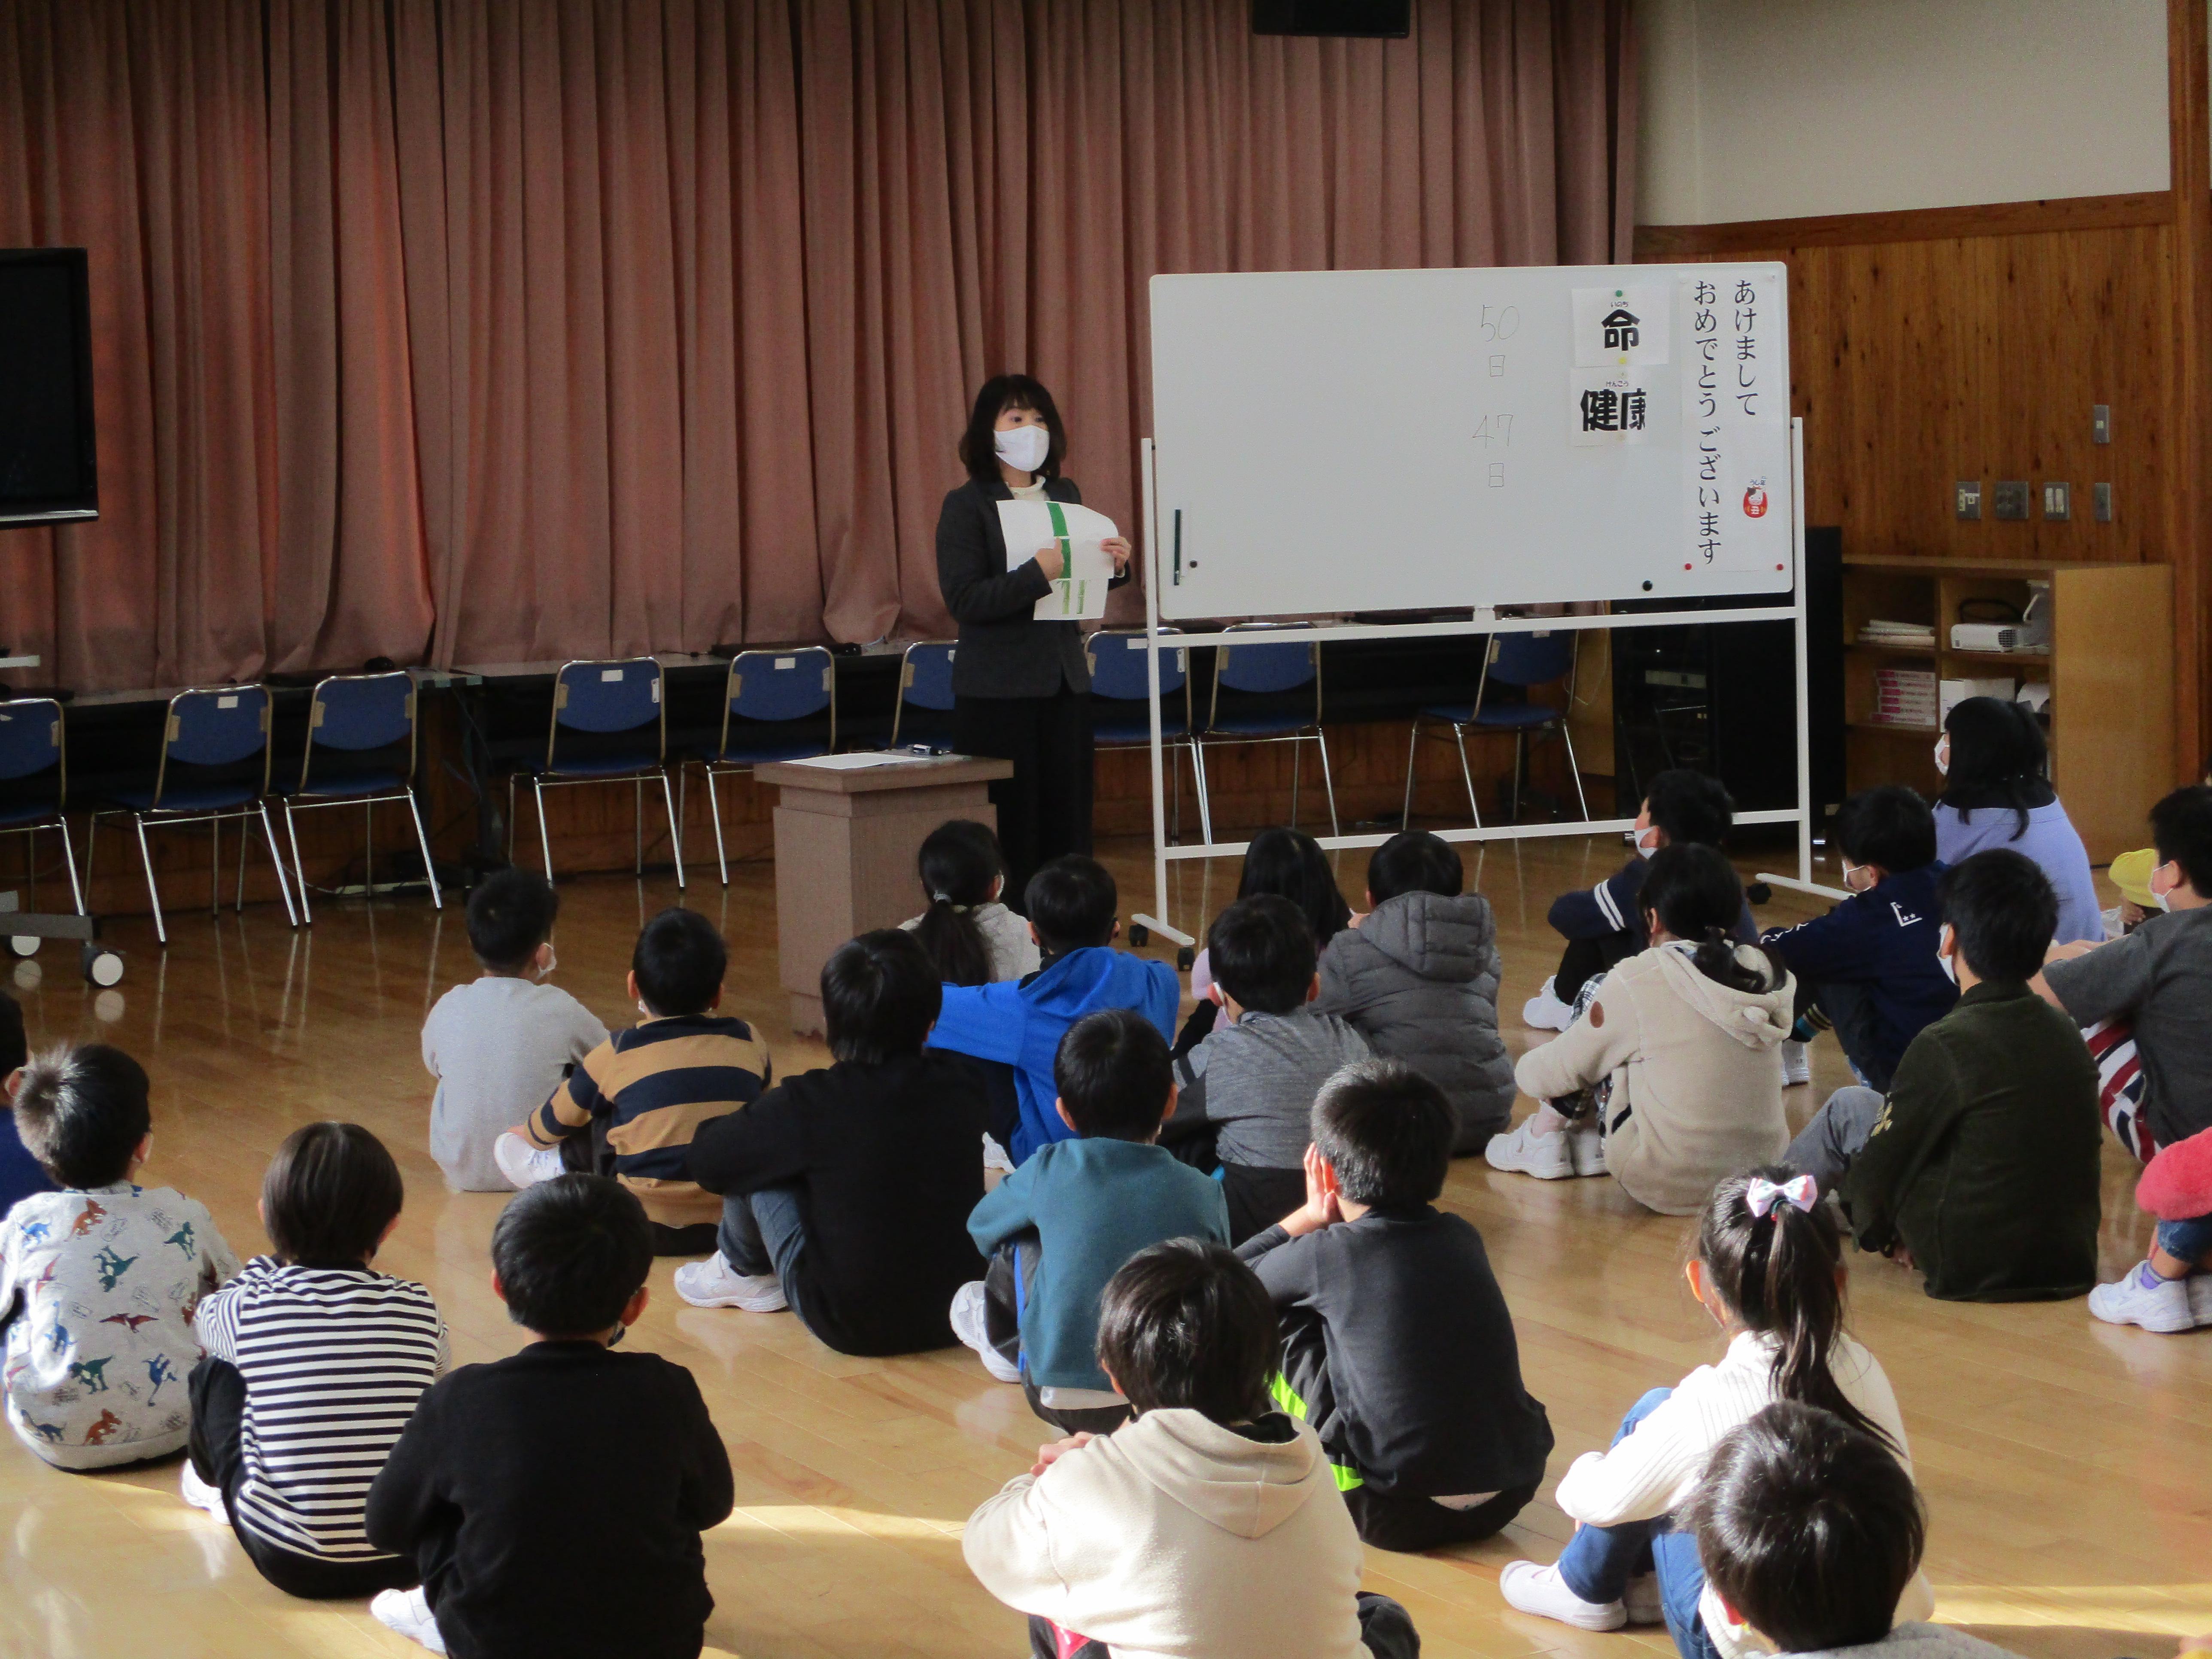 https://blog.izumo.ed.jp/kamitsu-sho/IMG_3026.JPG